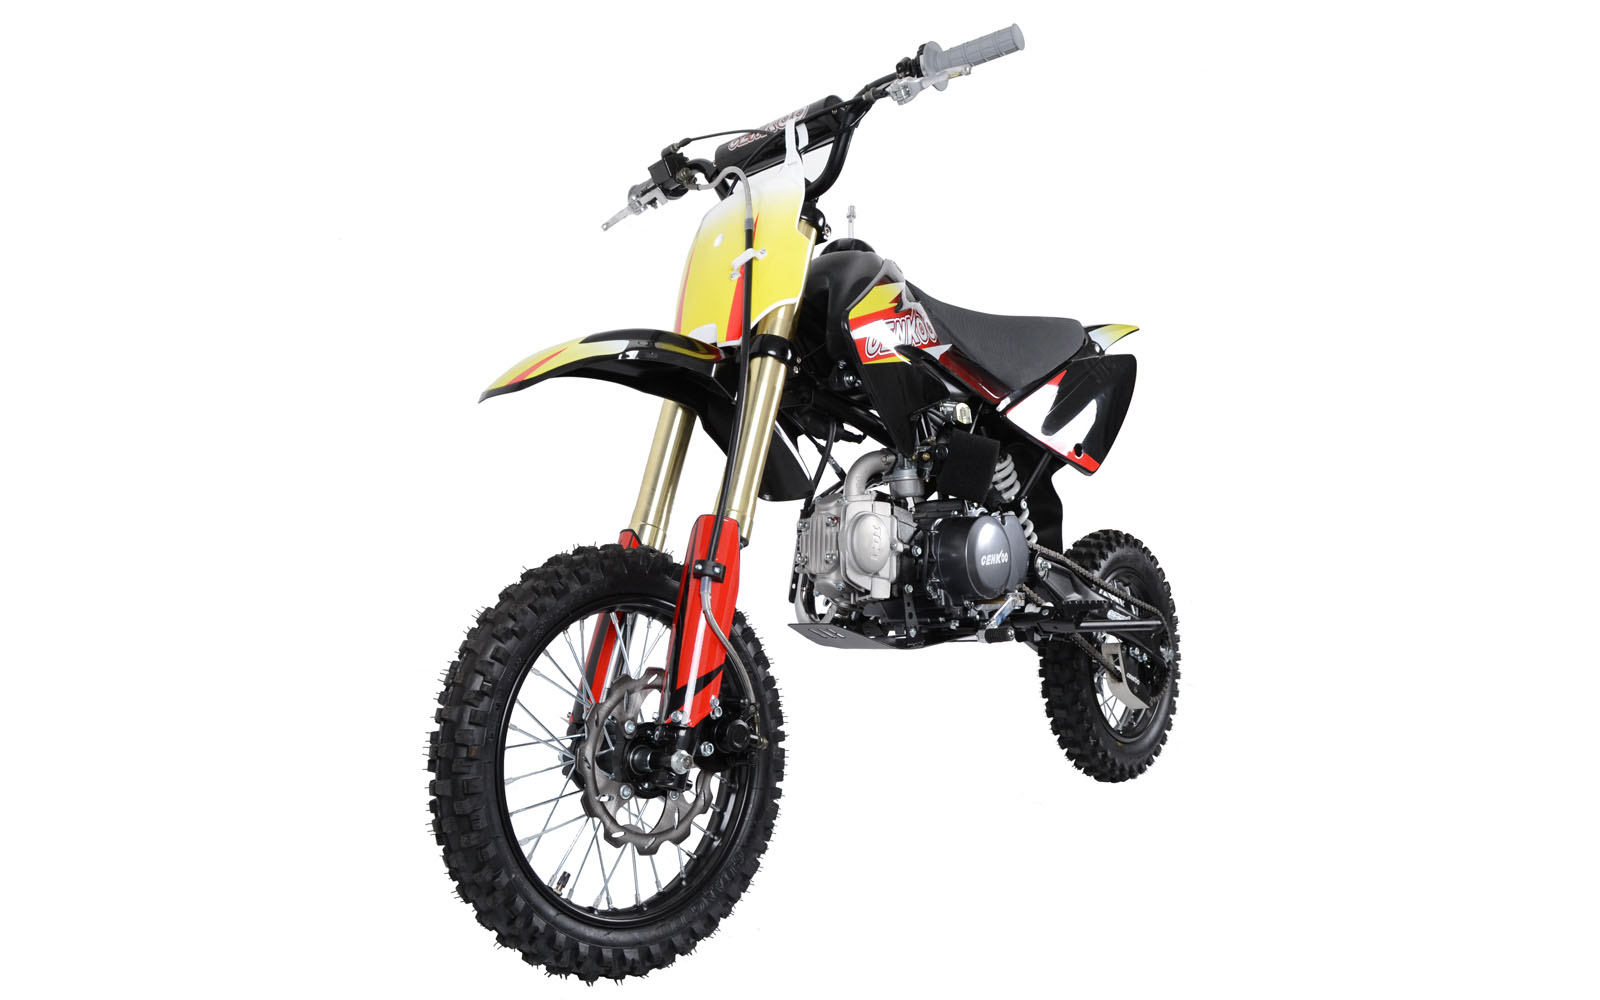 cenkoo cnko 125 125cc 14 12 cross dirt bike pit bike. Black Bedroom Furniture Sets. Home Design Ideas